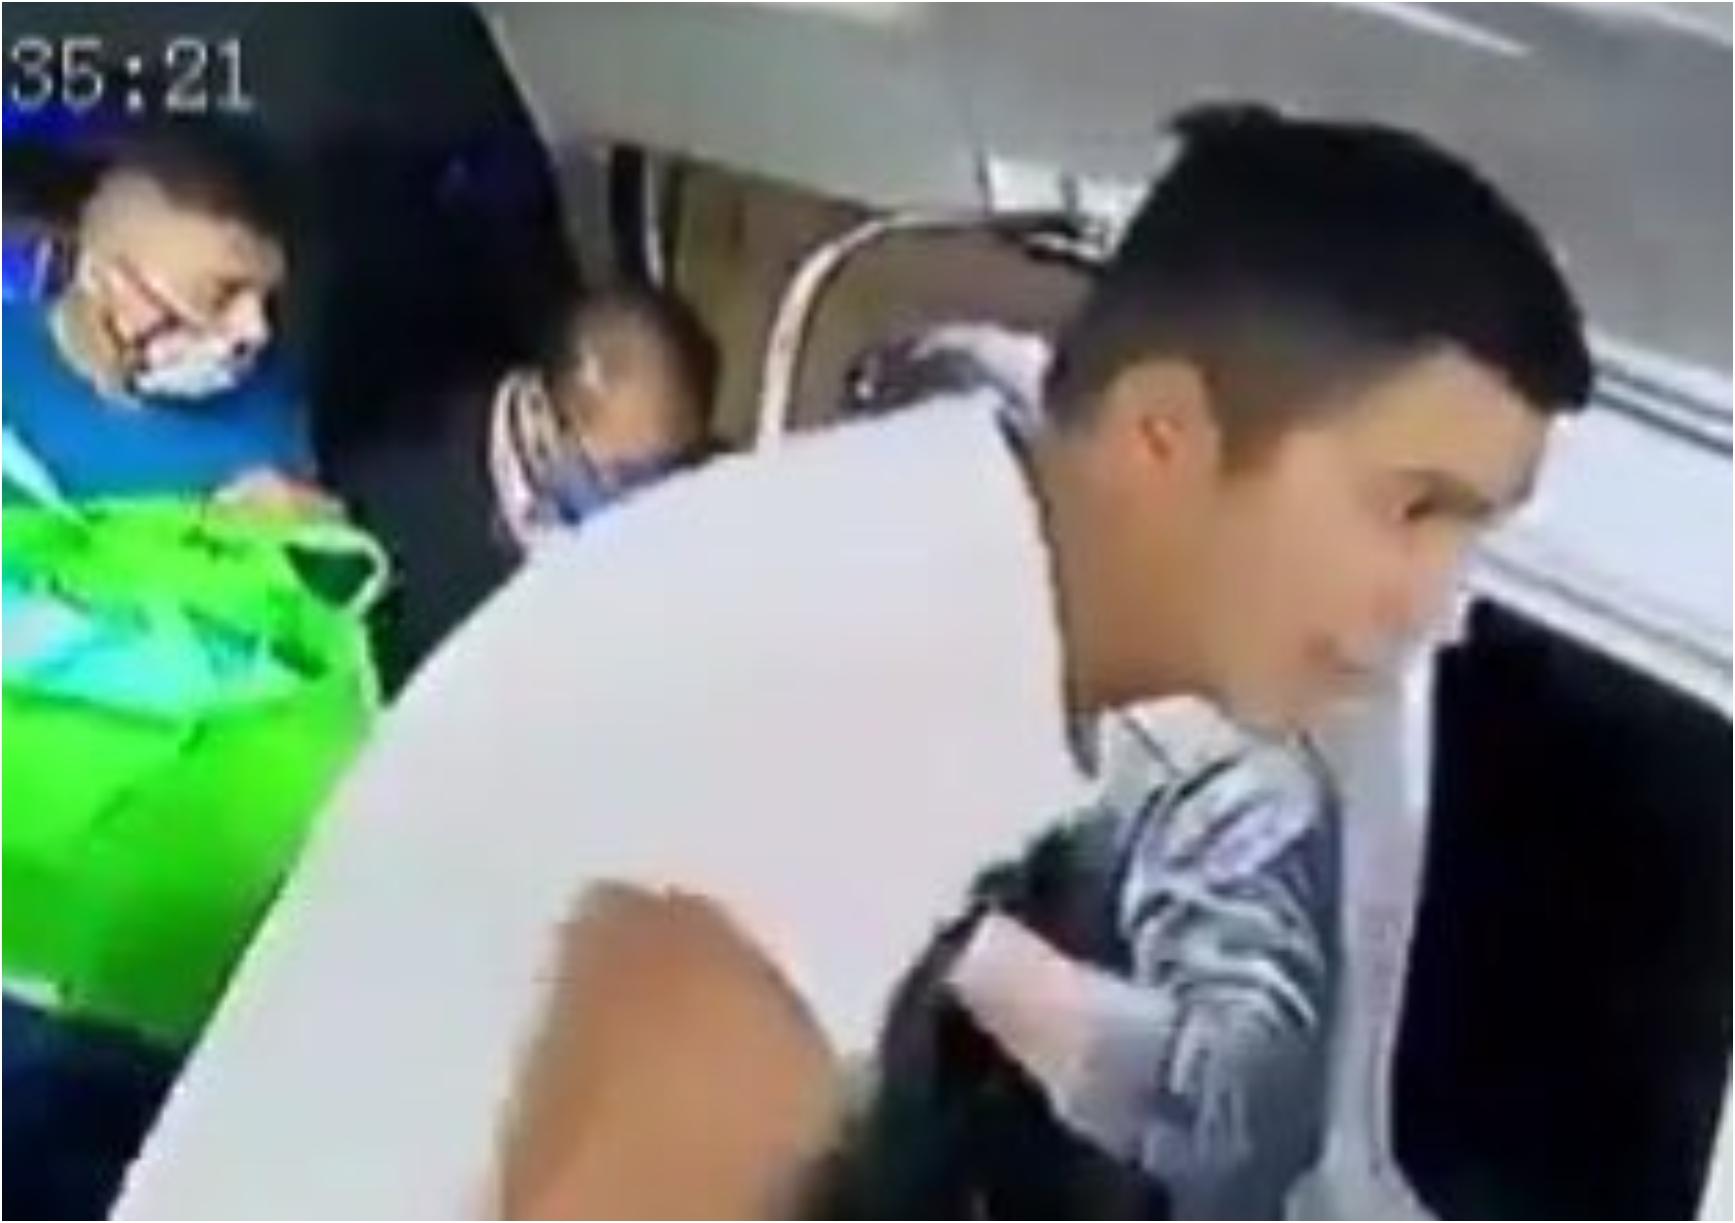 Asalto en transporte público en Ecatepec; reclaman a chofer